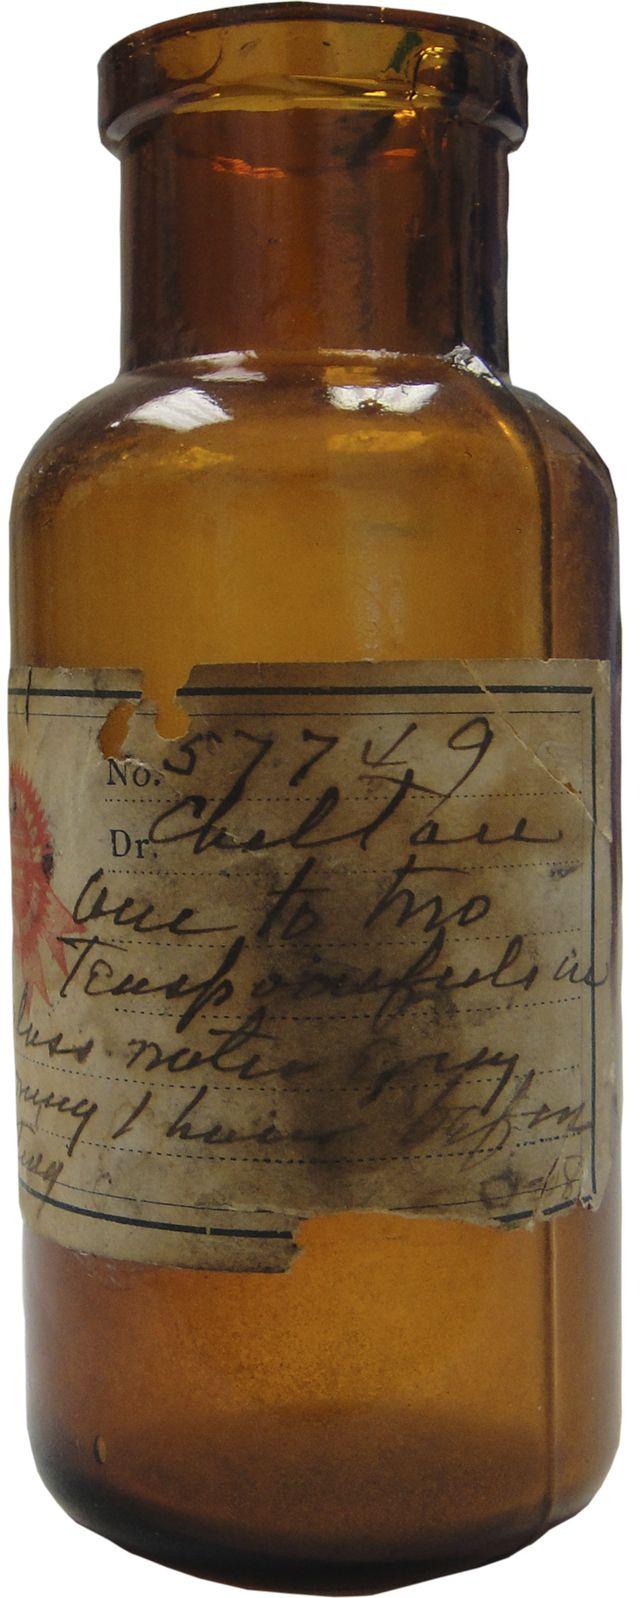 Absolute ethyl alcohol bottle vintage chemical bottle science lab - A Time To Remember Old Medicine Bottle